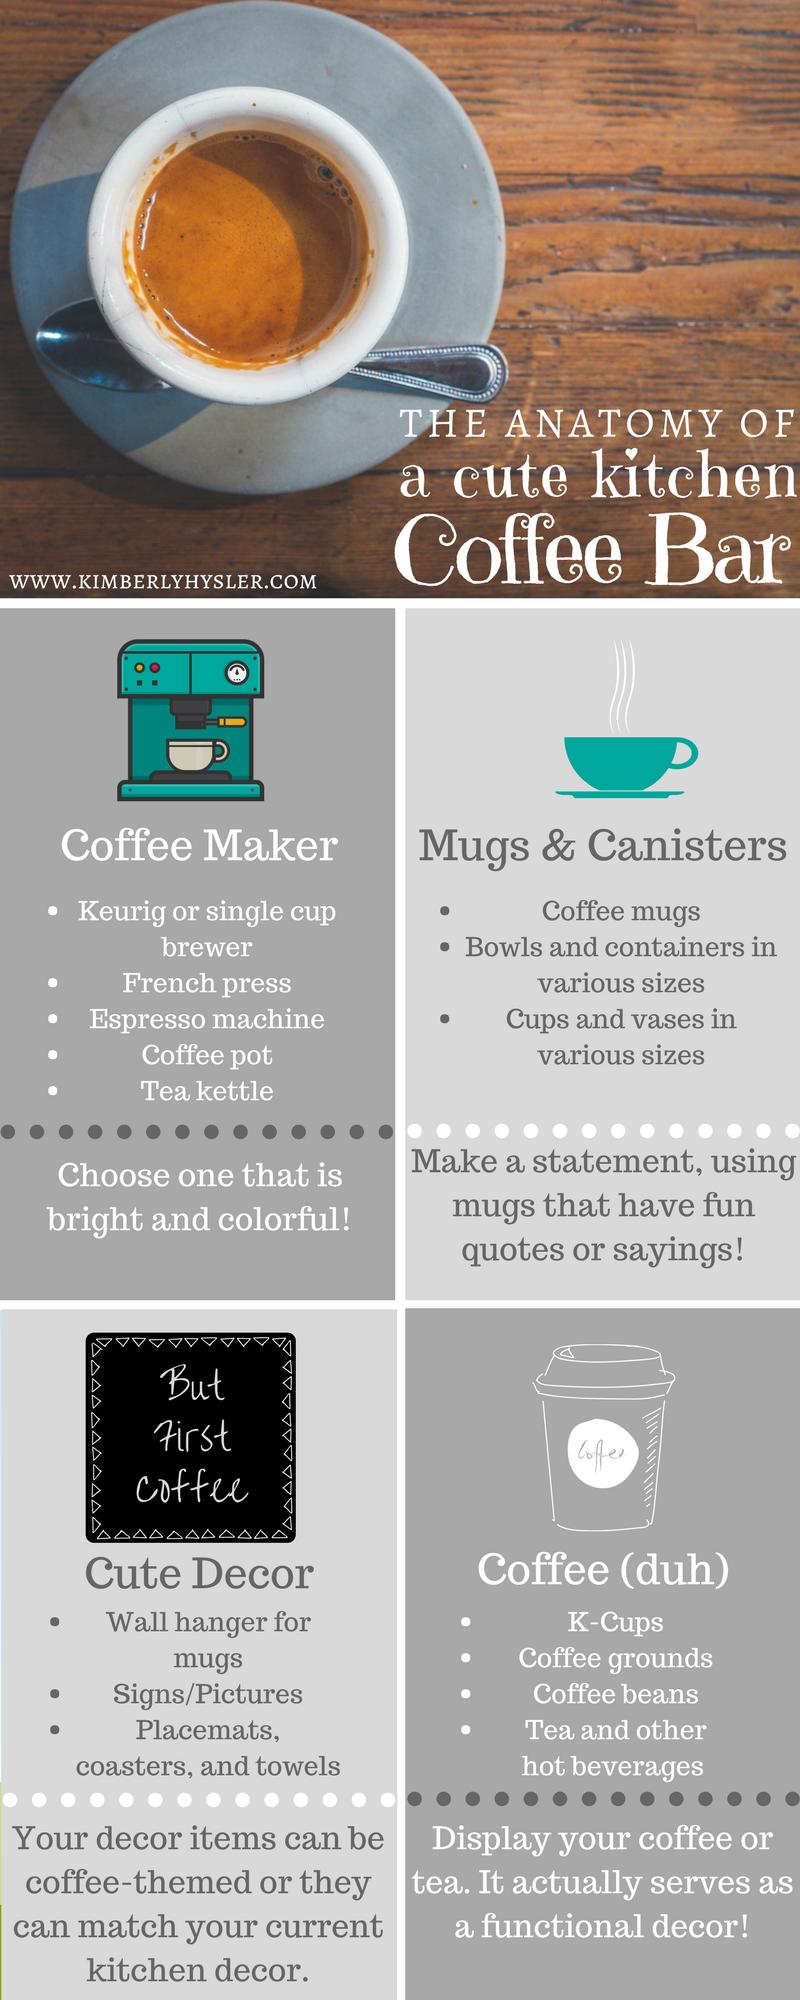 The Anatomy of a Cute Kitchen Coffee Bar | Kitchen coffee bars